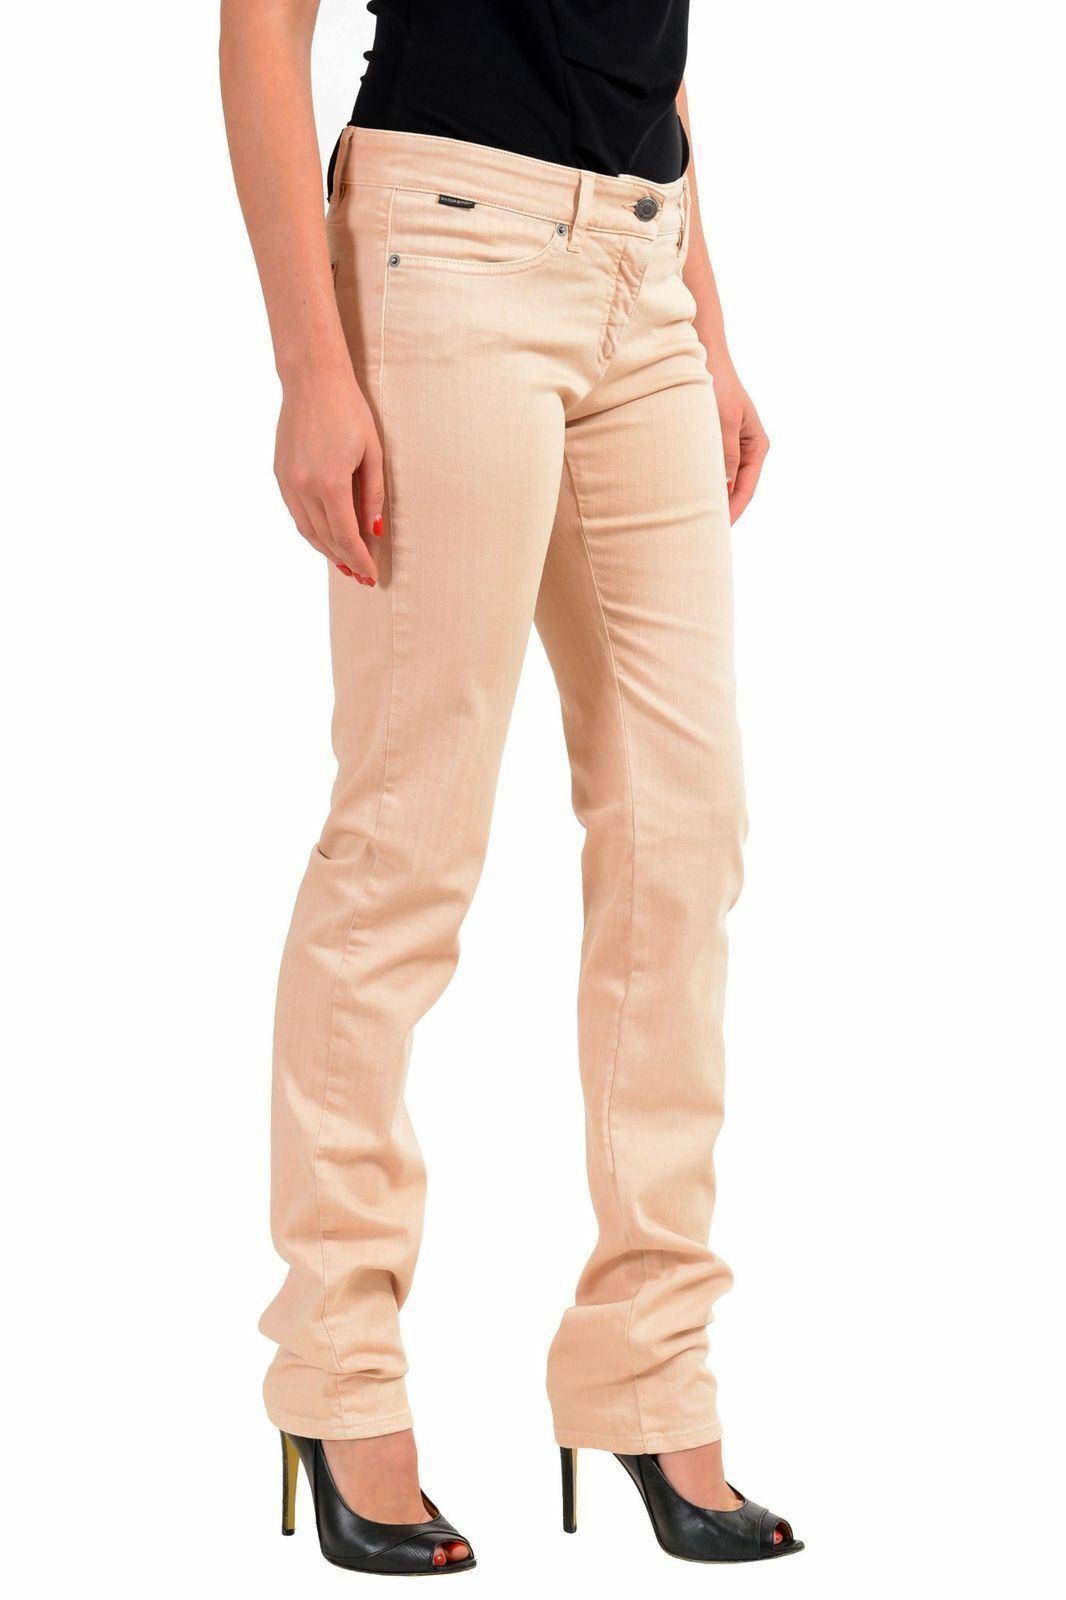 Viktor & & & Rolf Rosa Denim Damen Skinny Beine Jeans US S It 40 2e7350